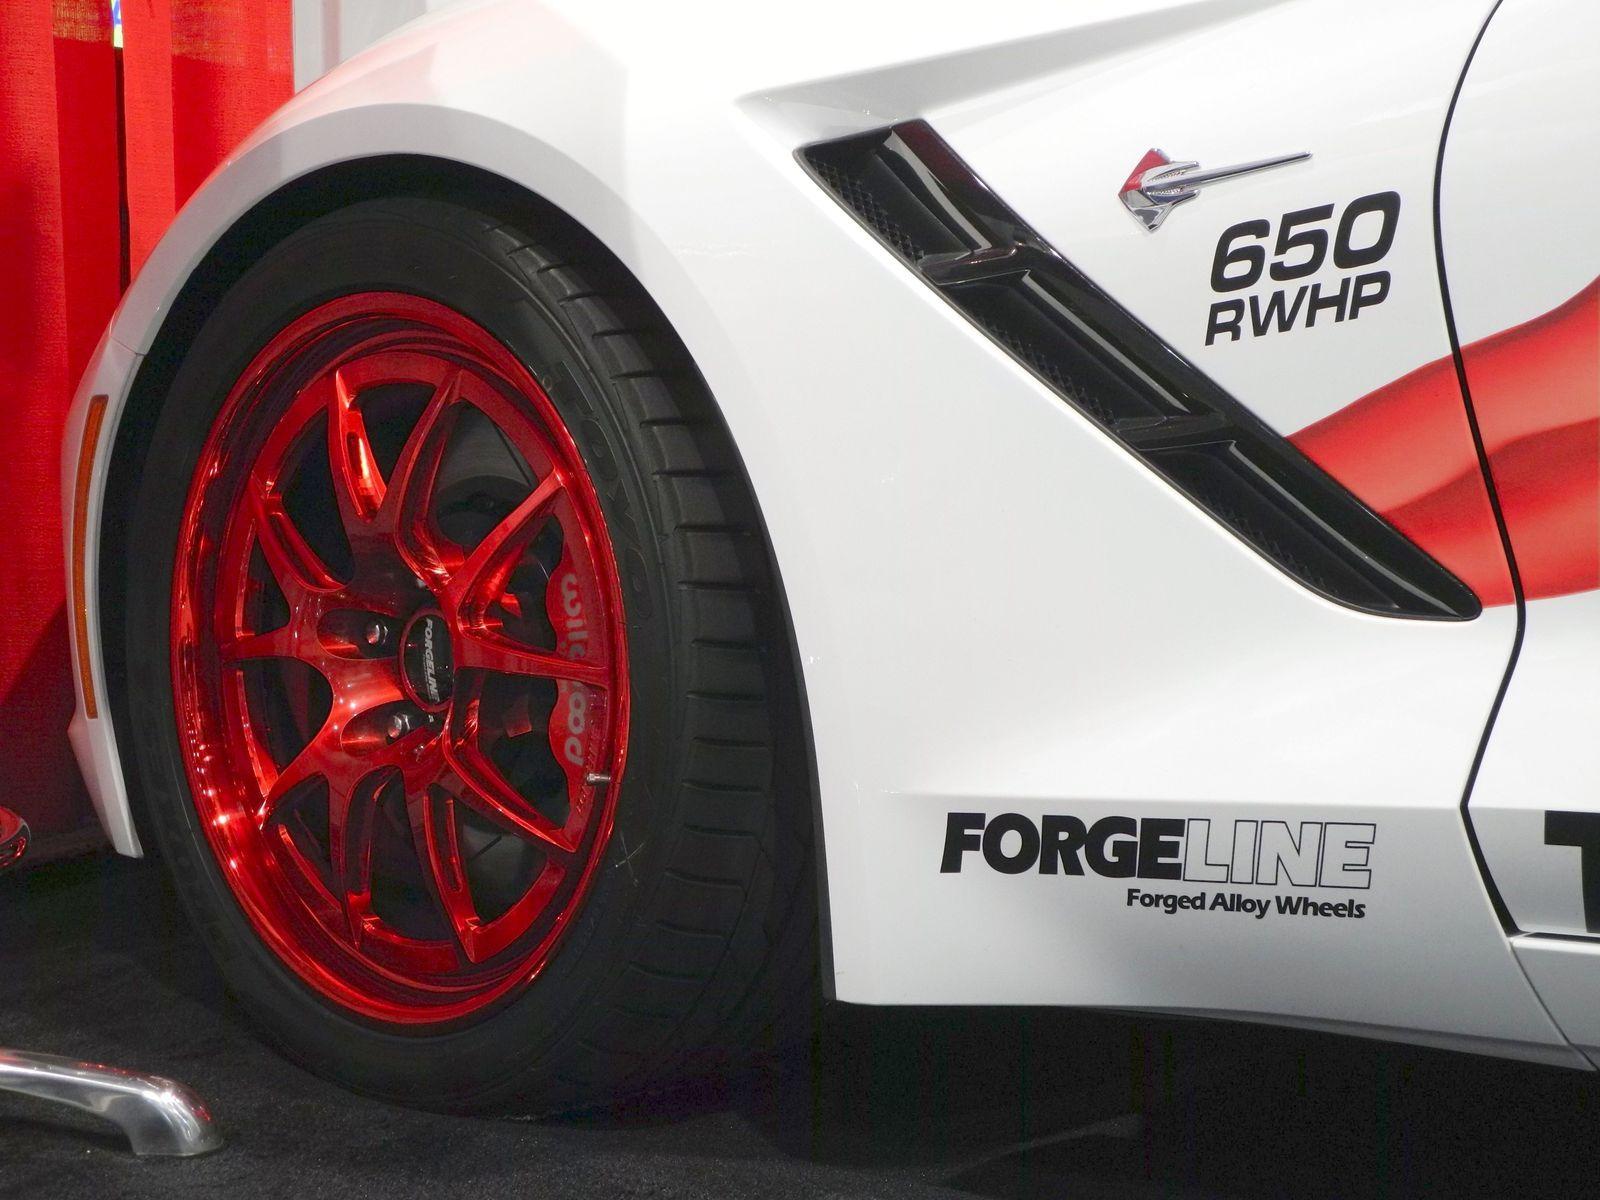 2014 Chevrolet Corvette Stingray | STS Turbo's Turbocharged C7 Corvette Stingray on Forgeline GA3R Wheels